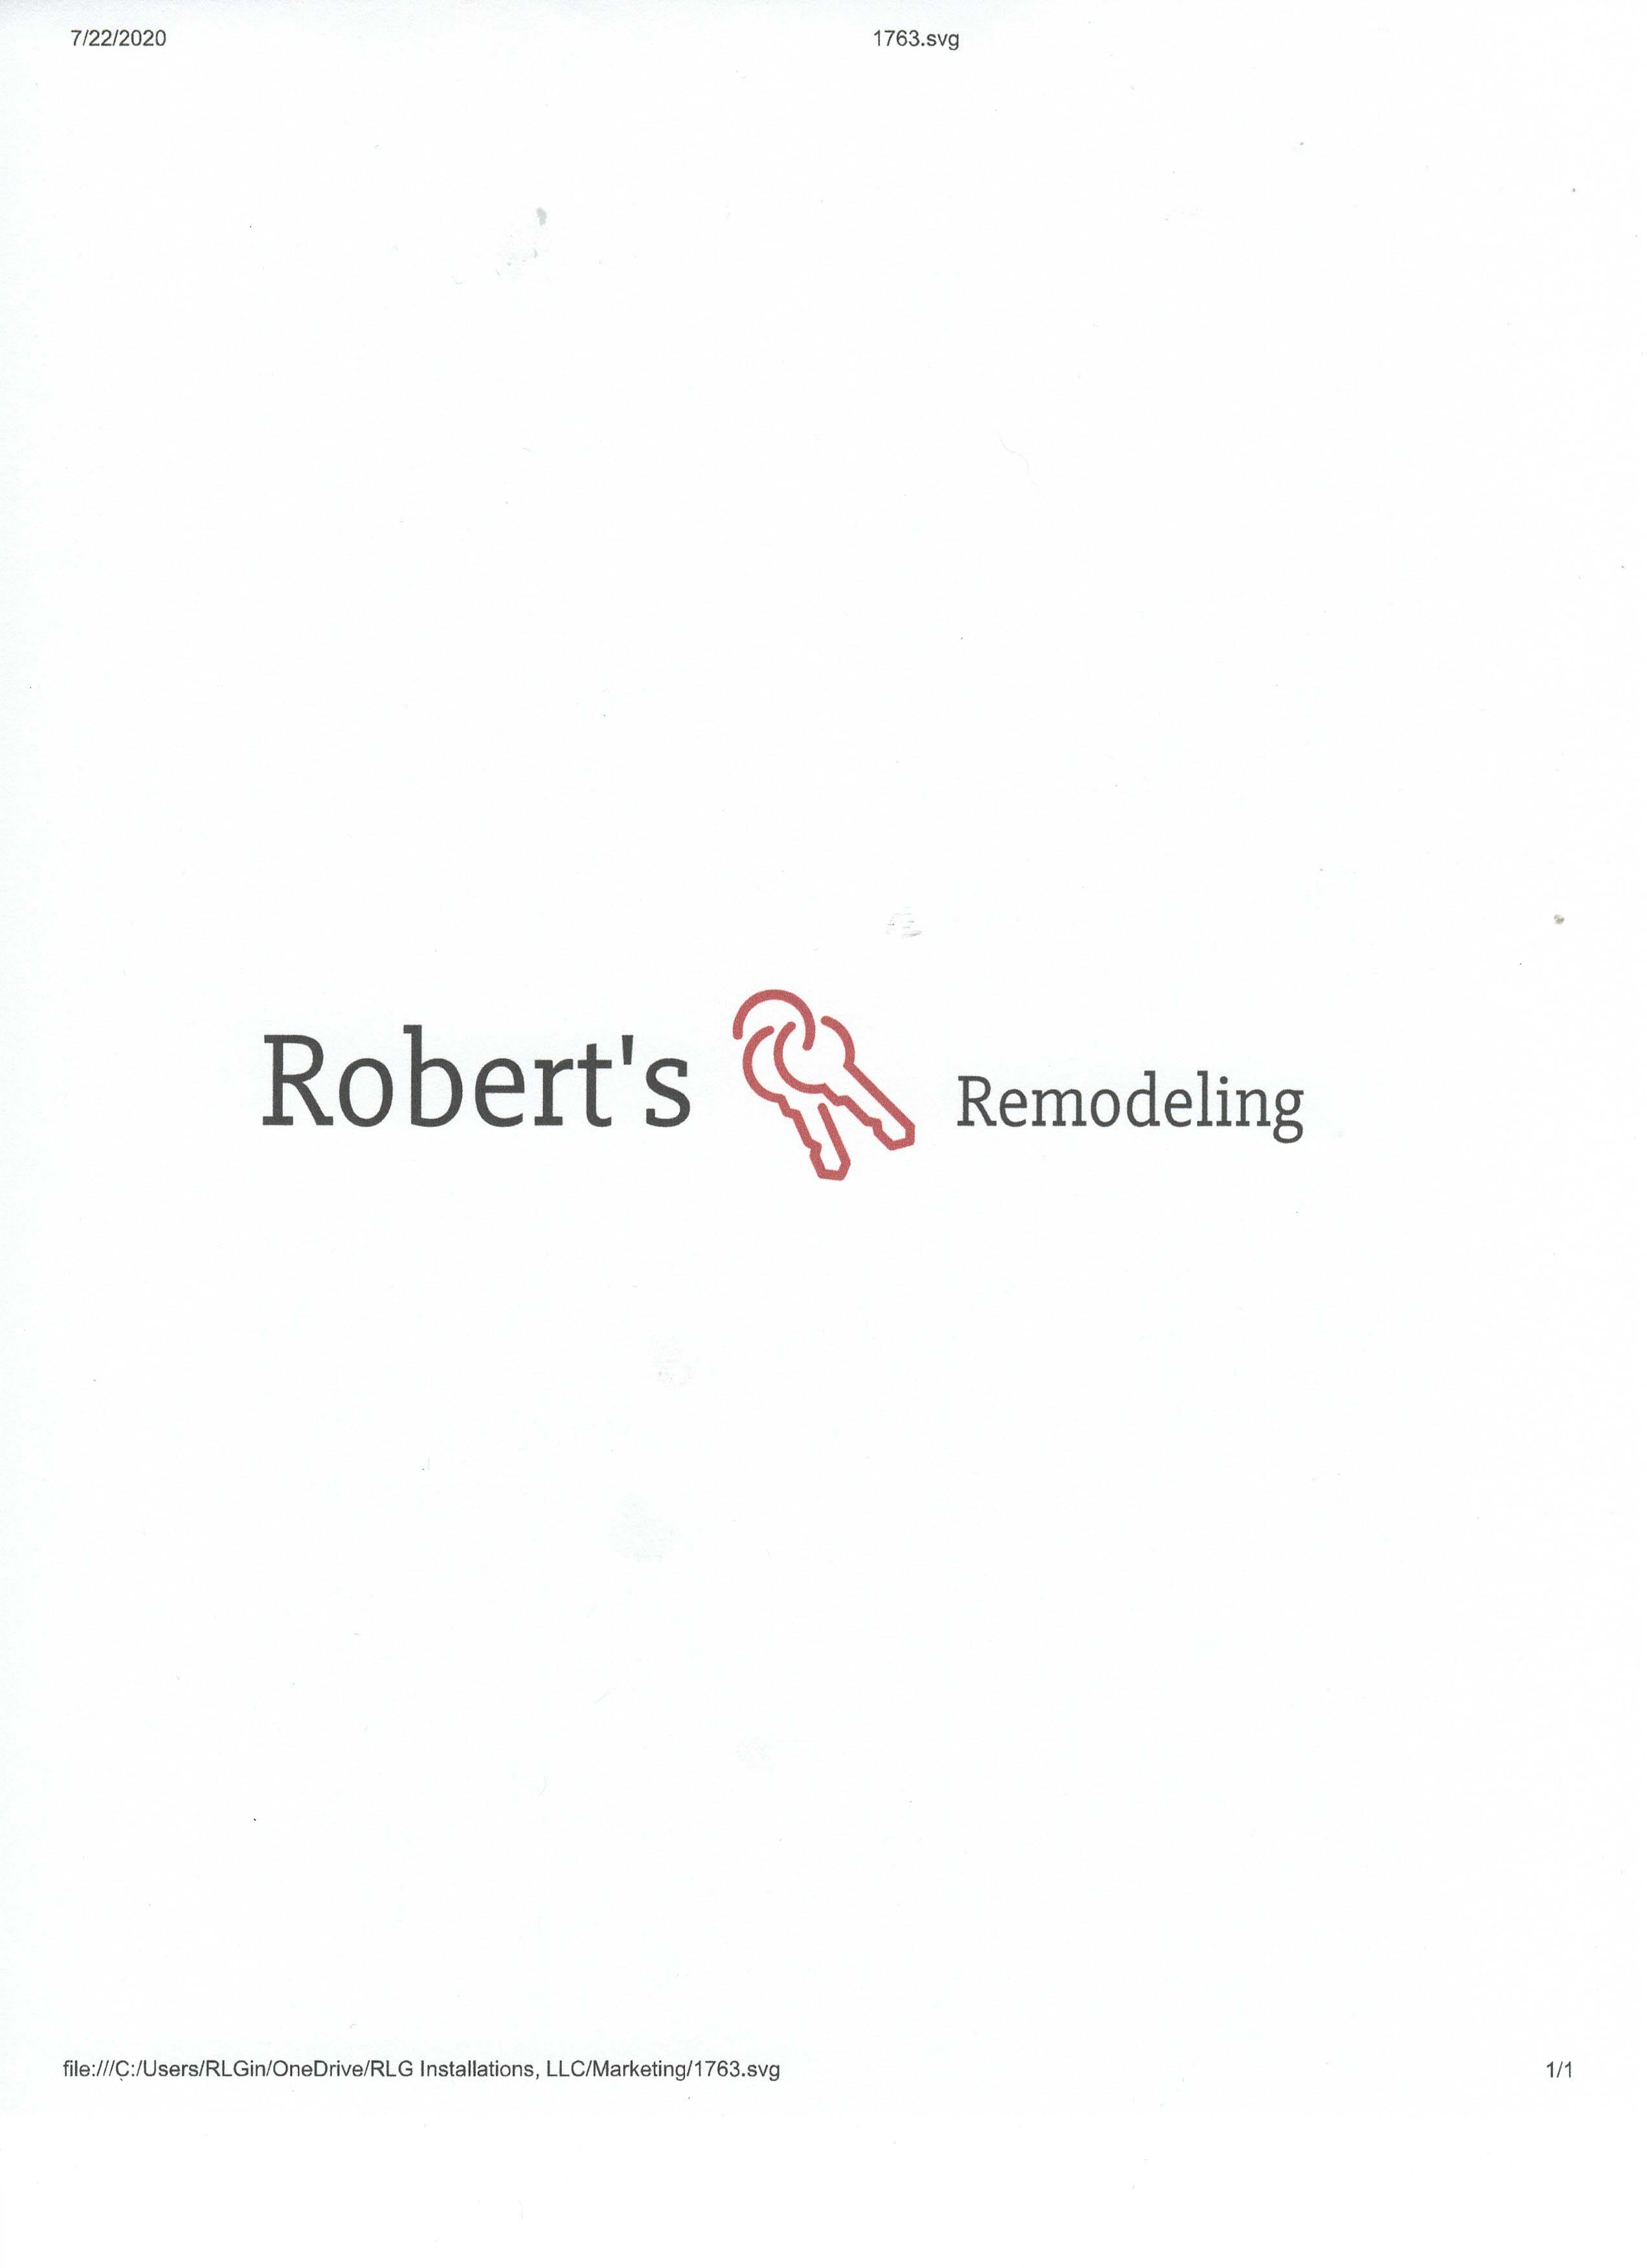 Robert's Remodeling